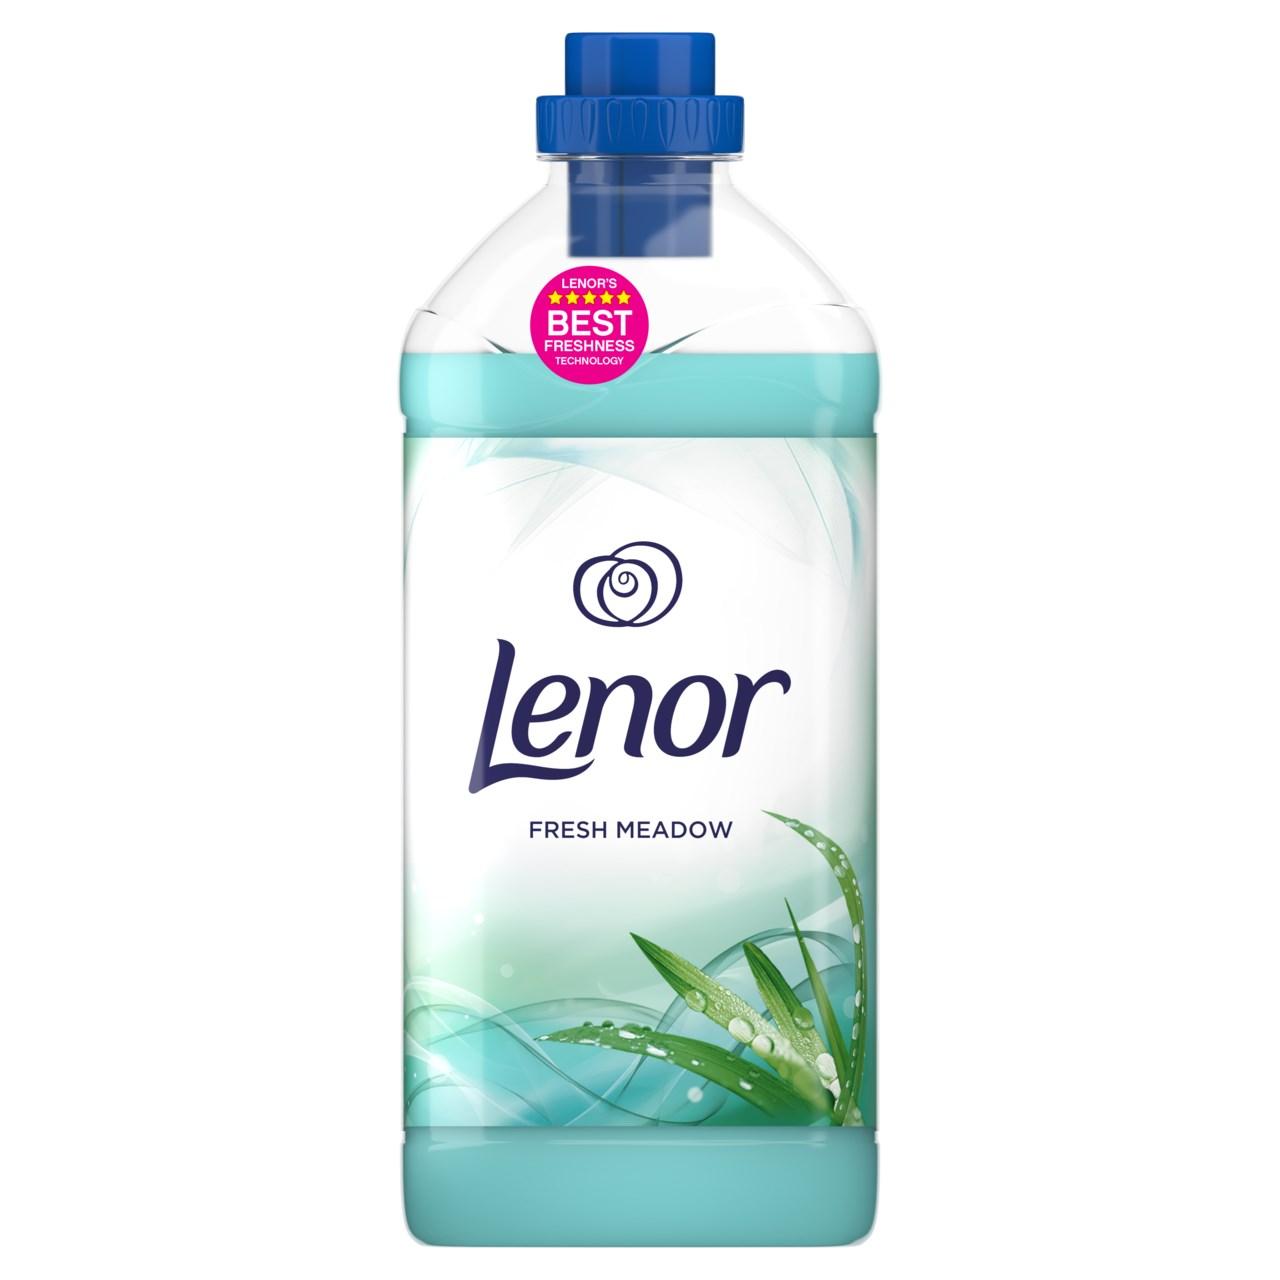 Lenor Fresh Meadow aviváž 60 praní 1x1800 ml